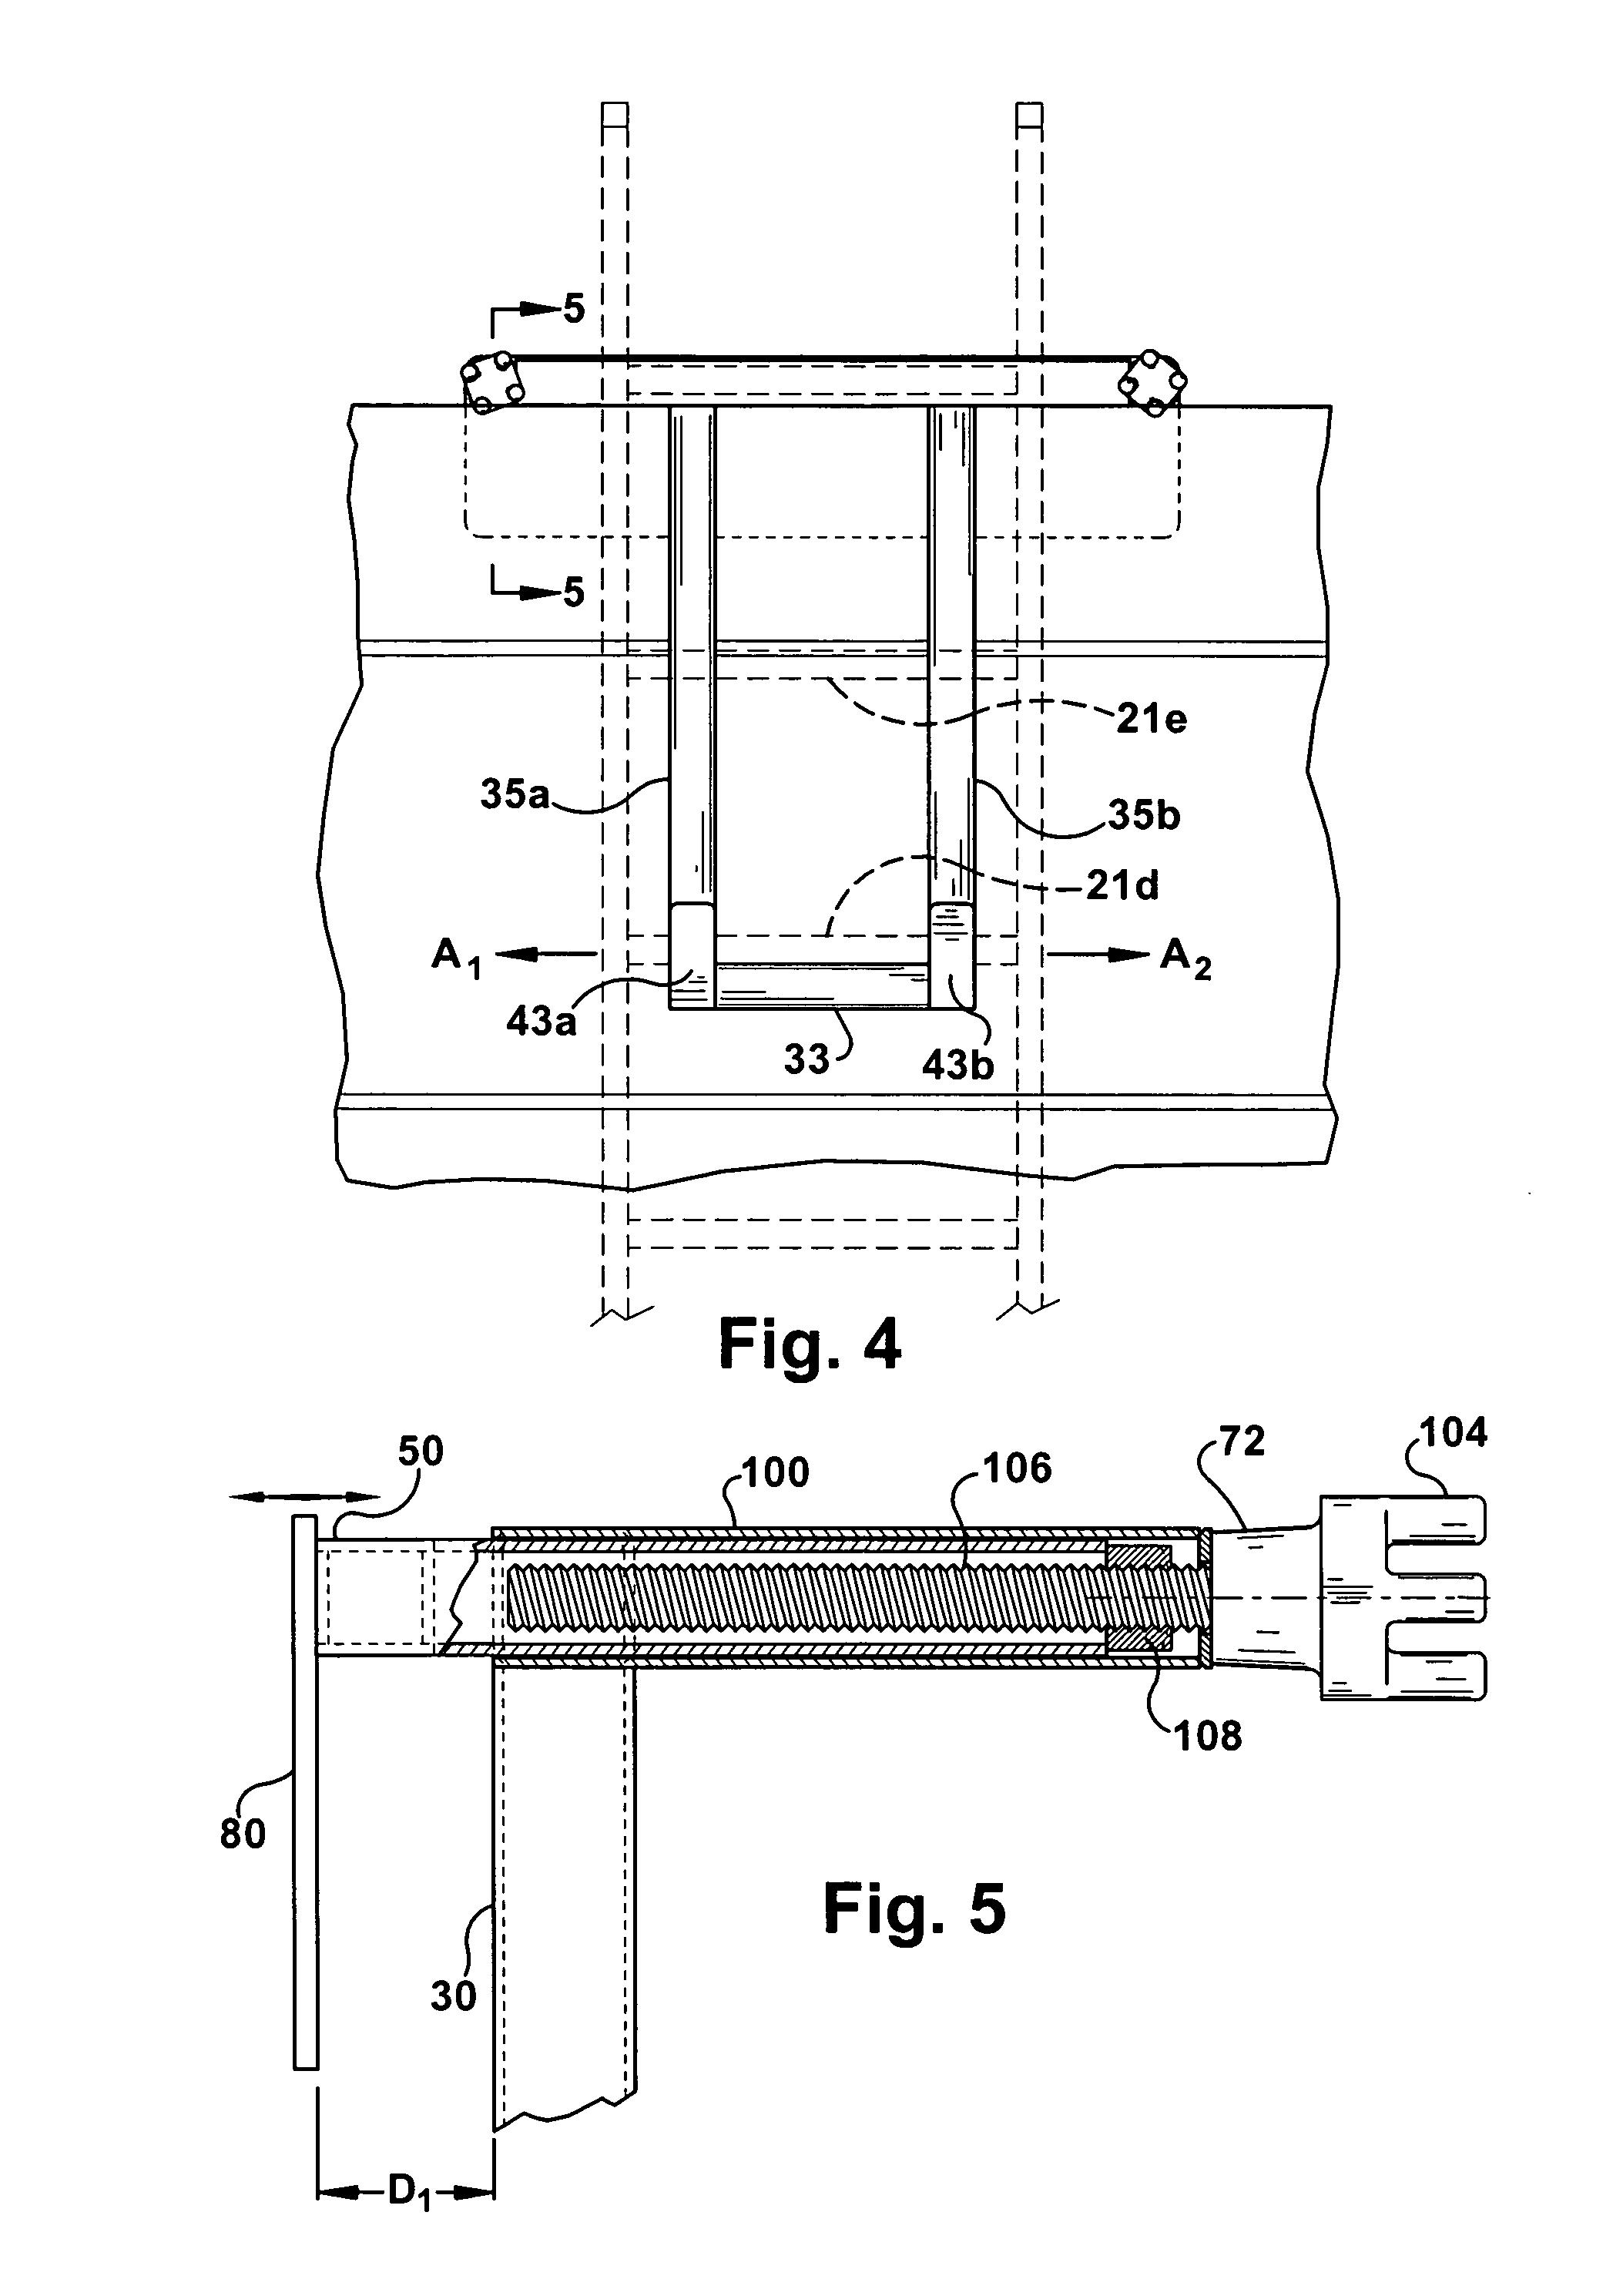 Trench Box Ladder Bracket Patent Us20070175699 Ladder